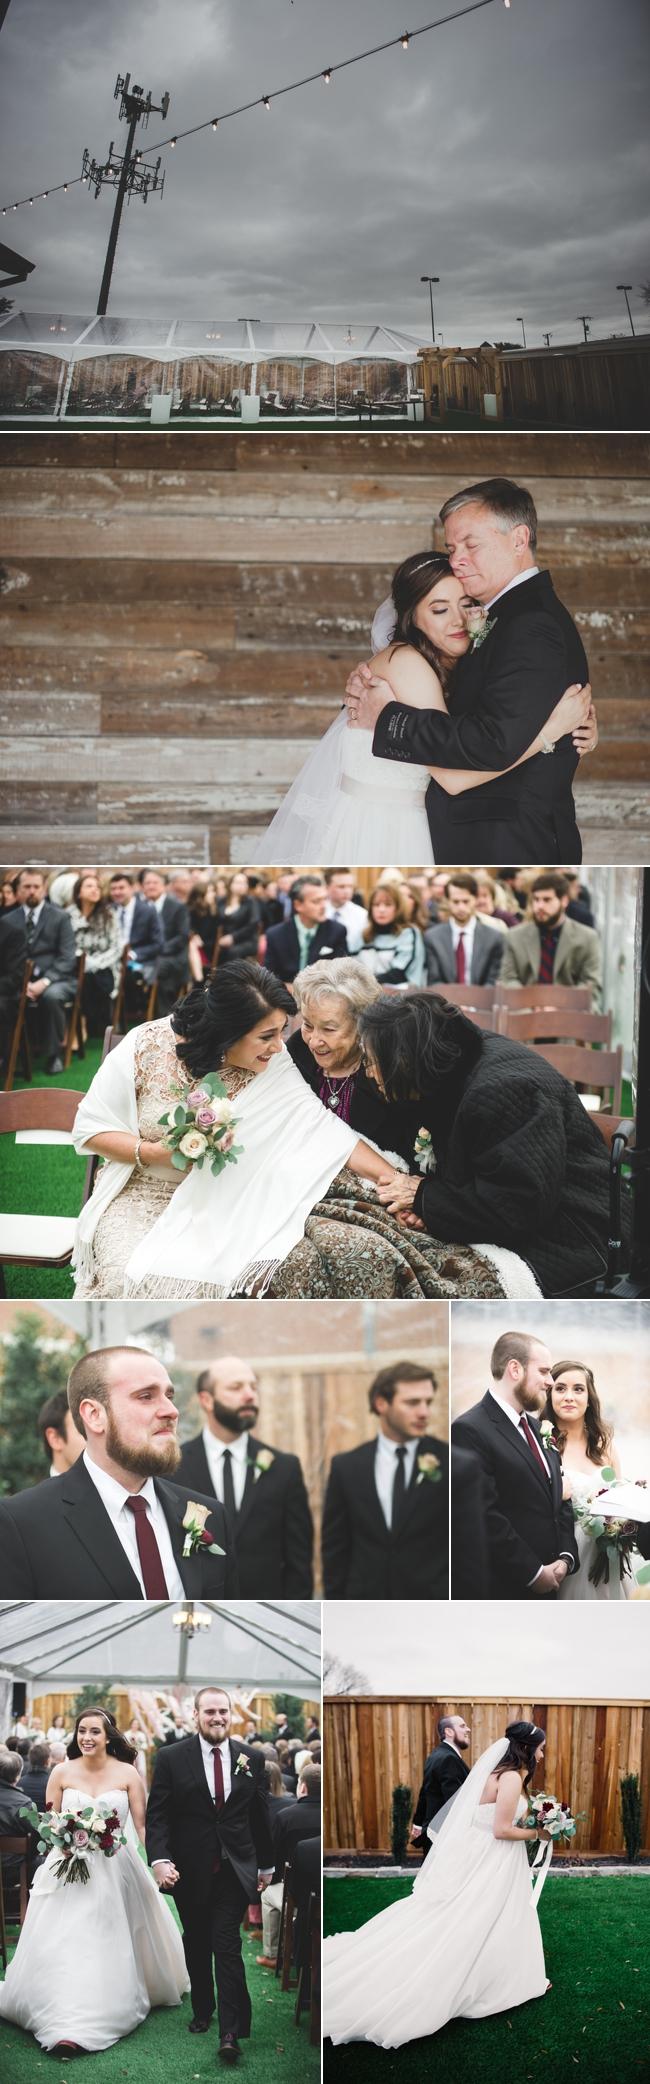 destination-wedding-photographer 5.jpg